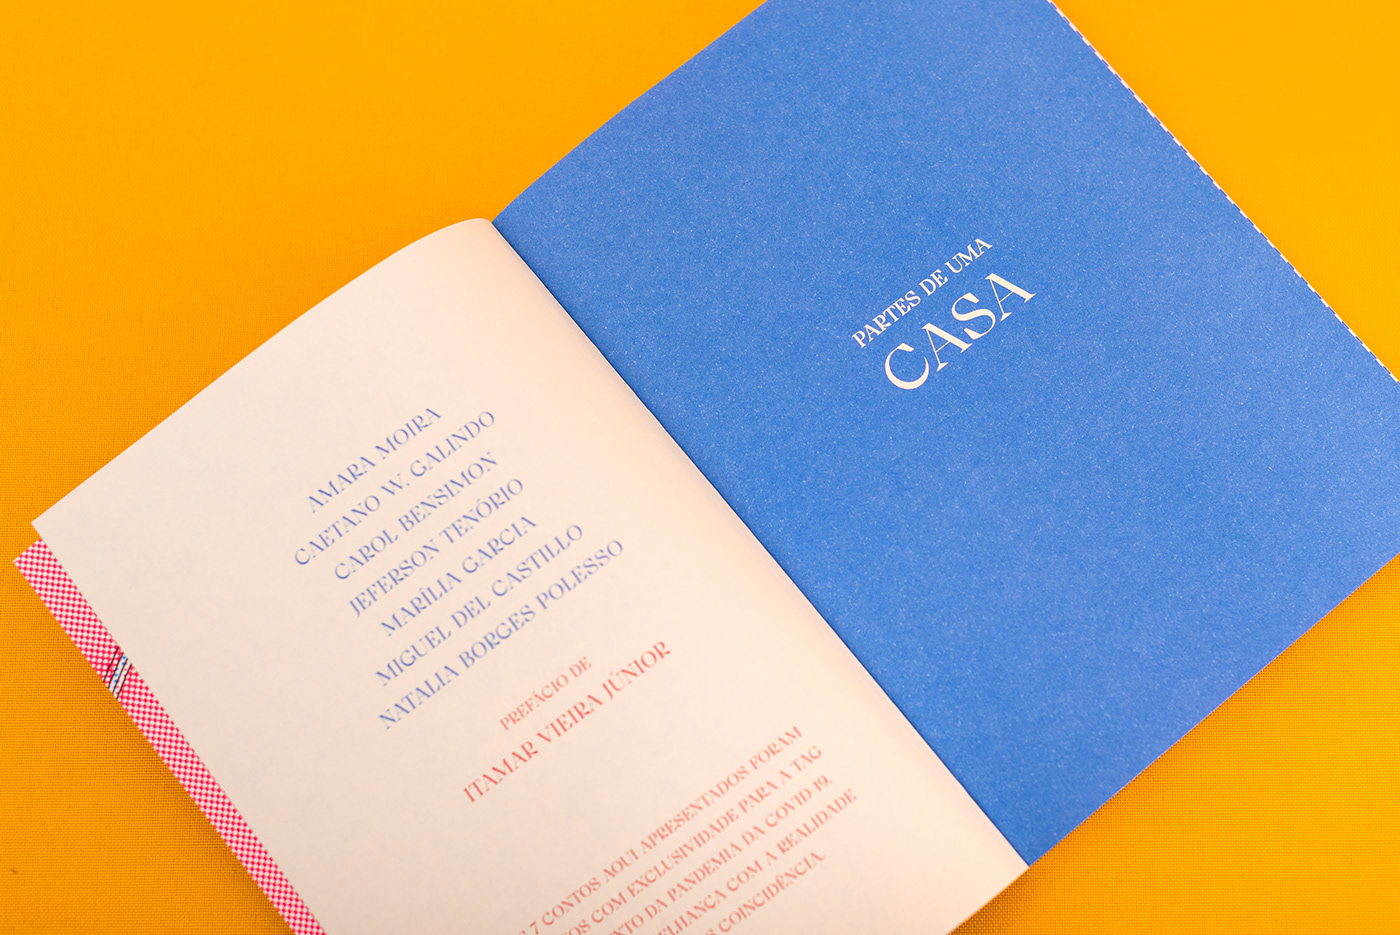 book cover book design Cover Book halftone Livro she designs books short stories book